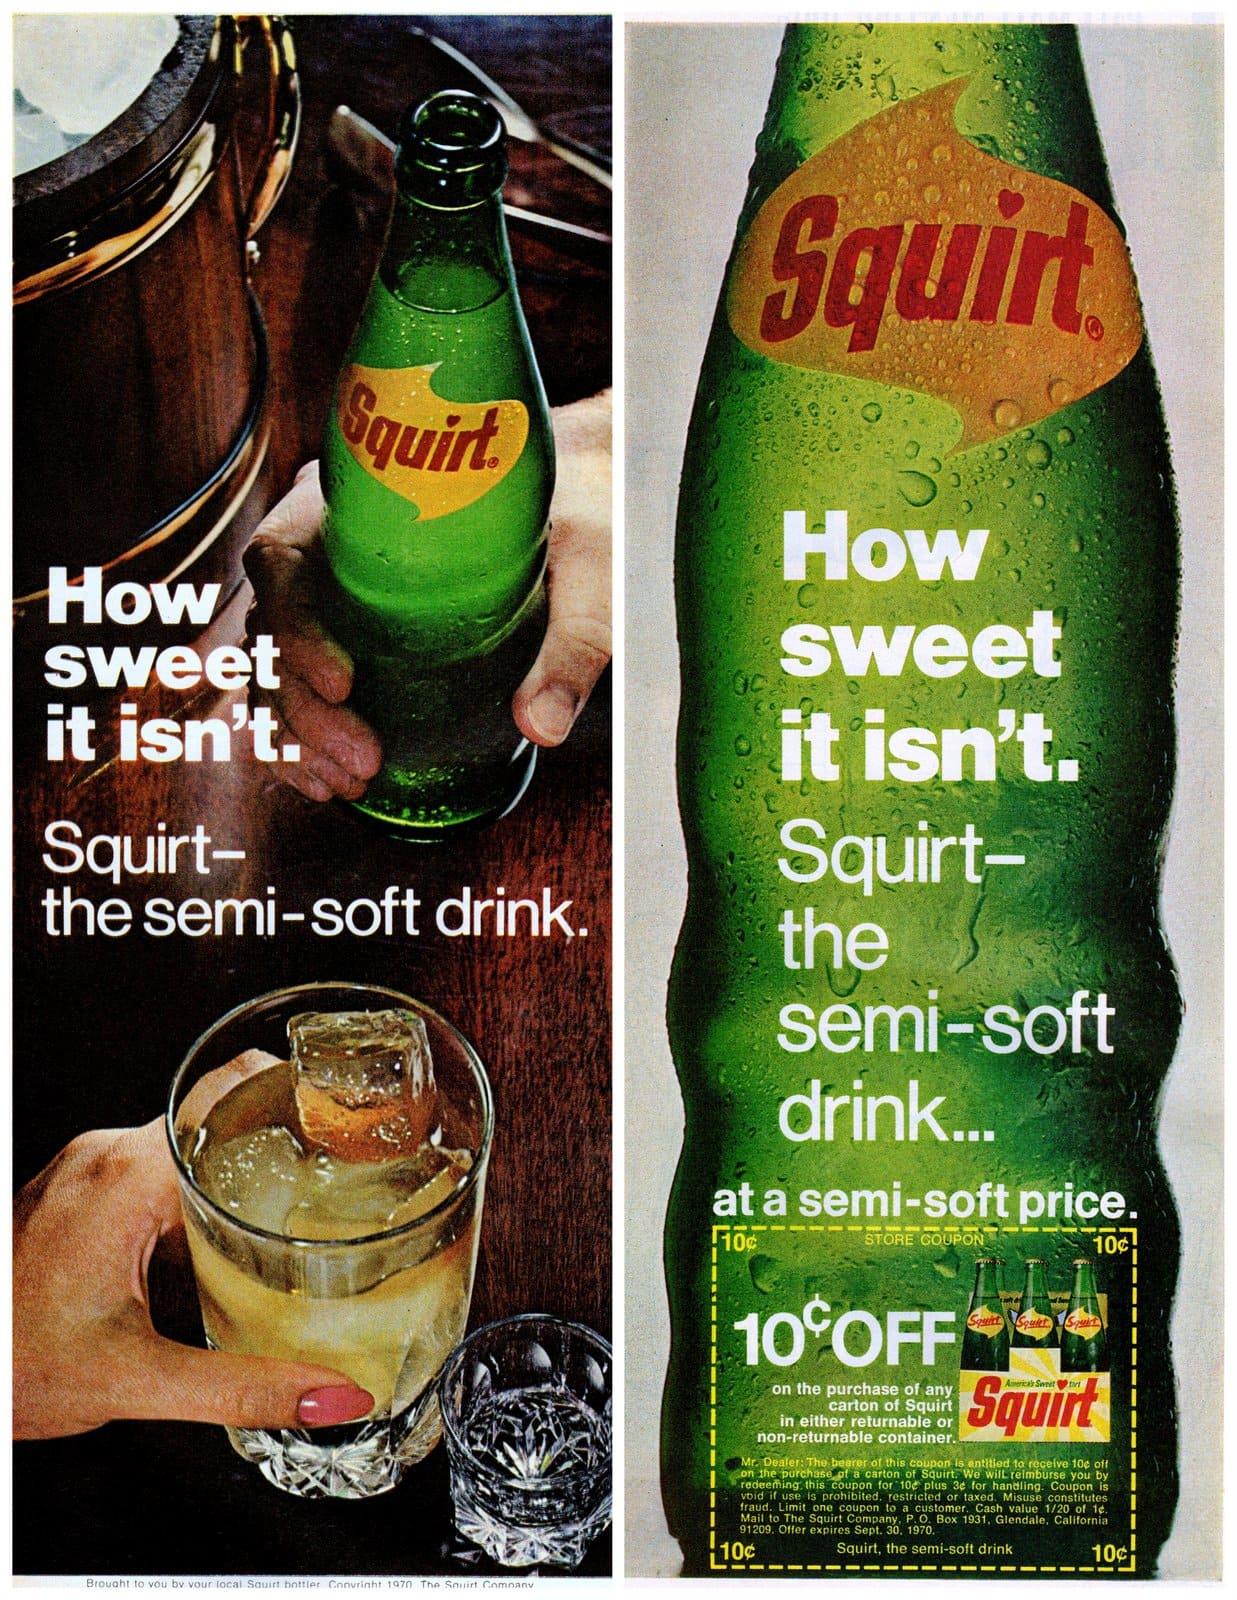 Squirt semi-soft drink - Vintage soda bottles (1970)